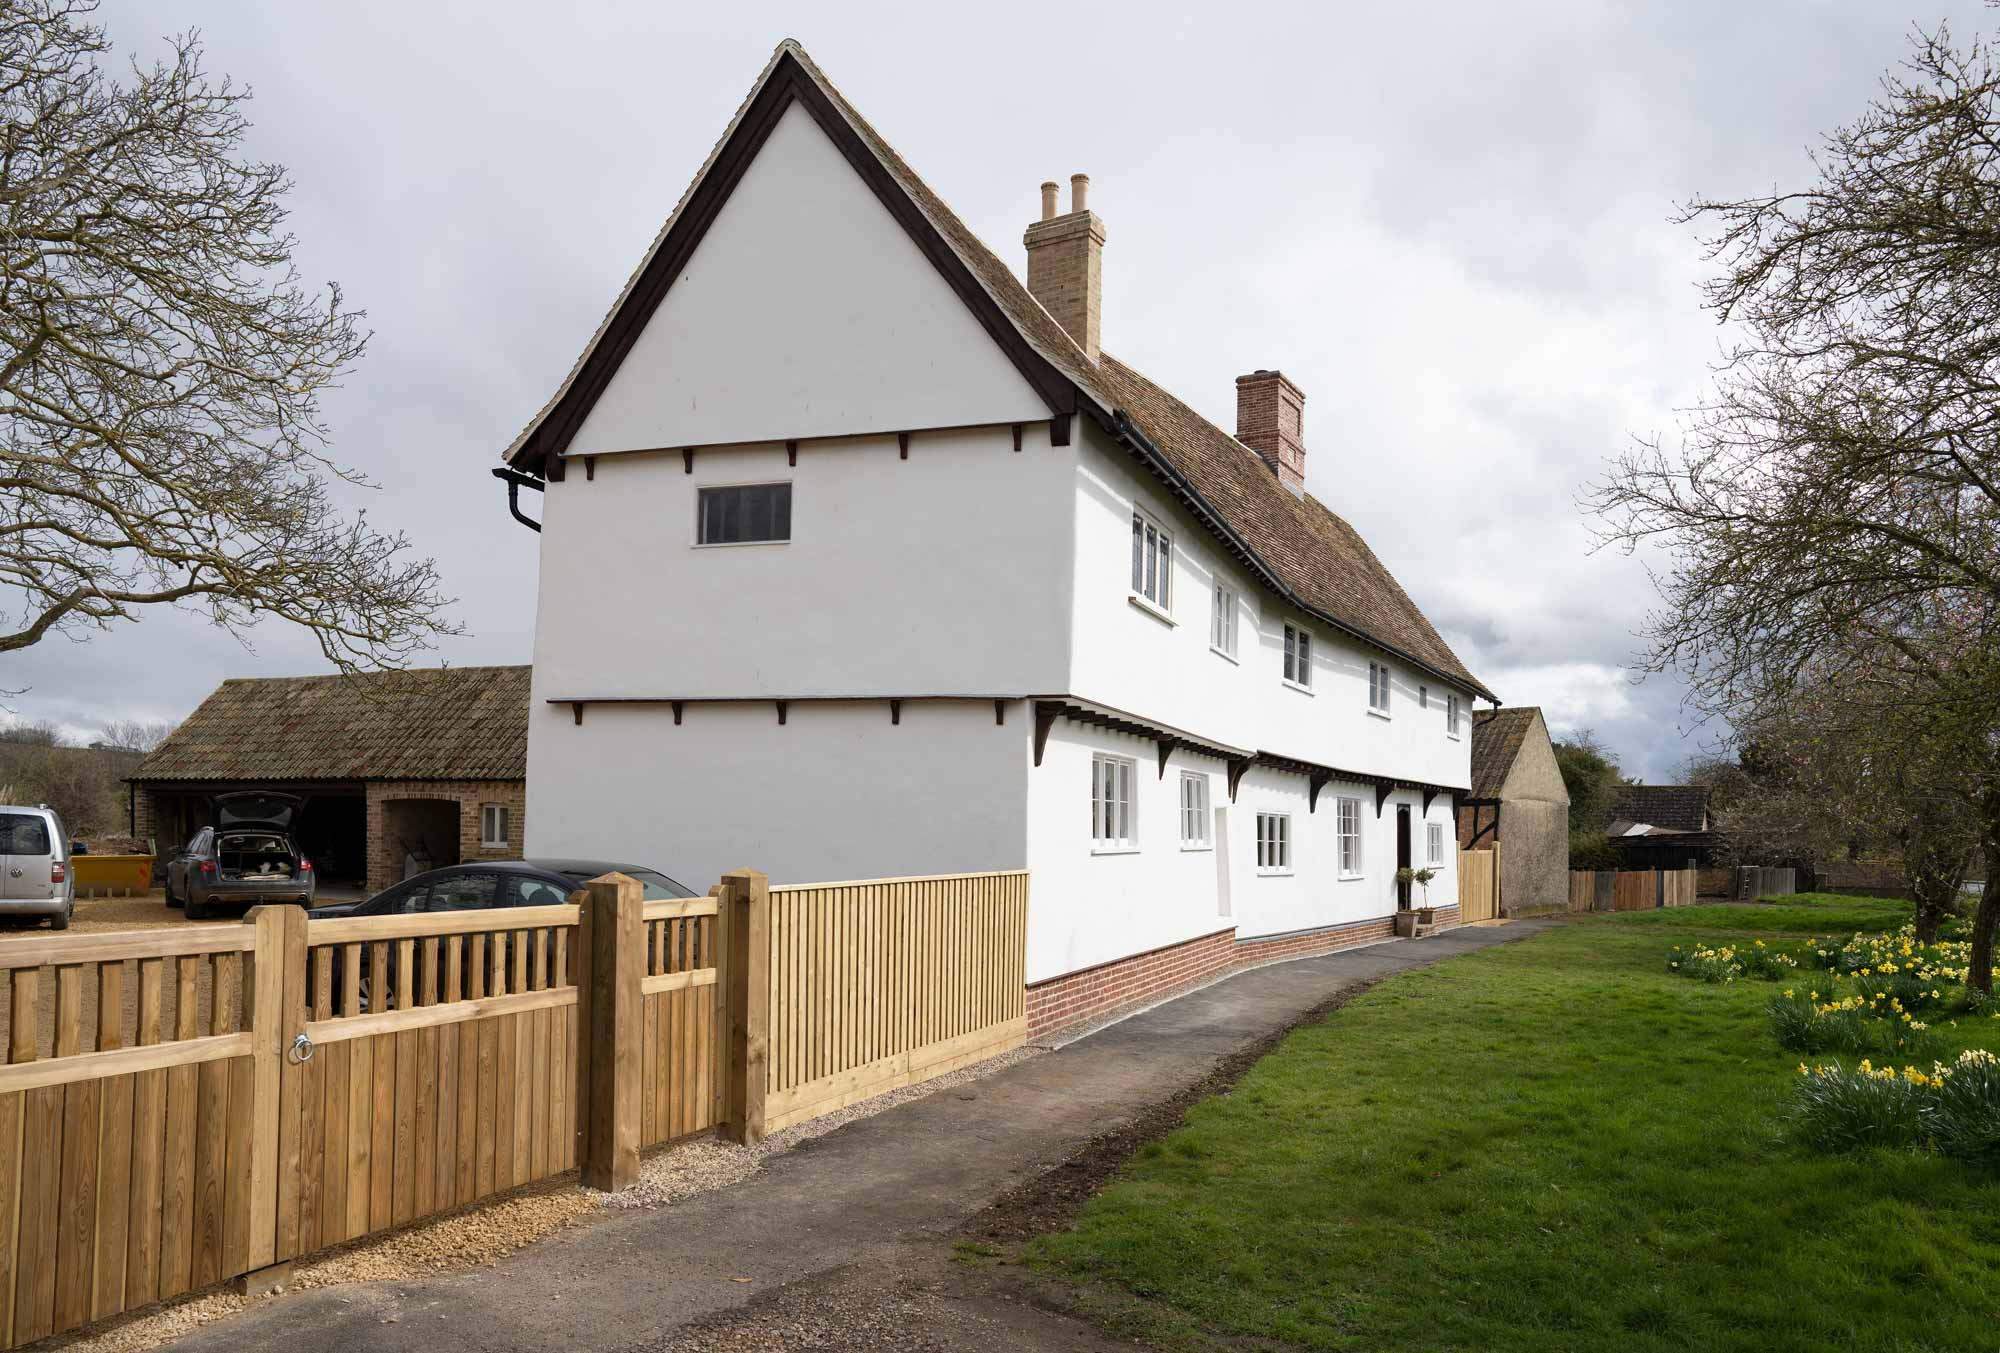 Spaldwick Manor